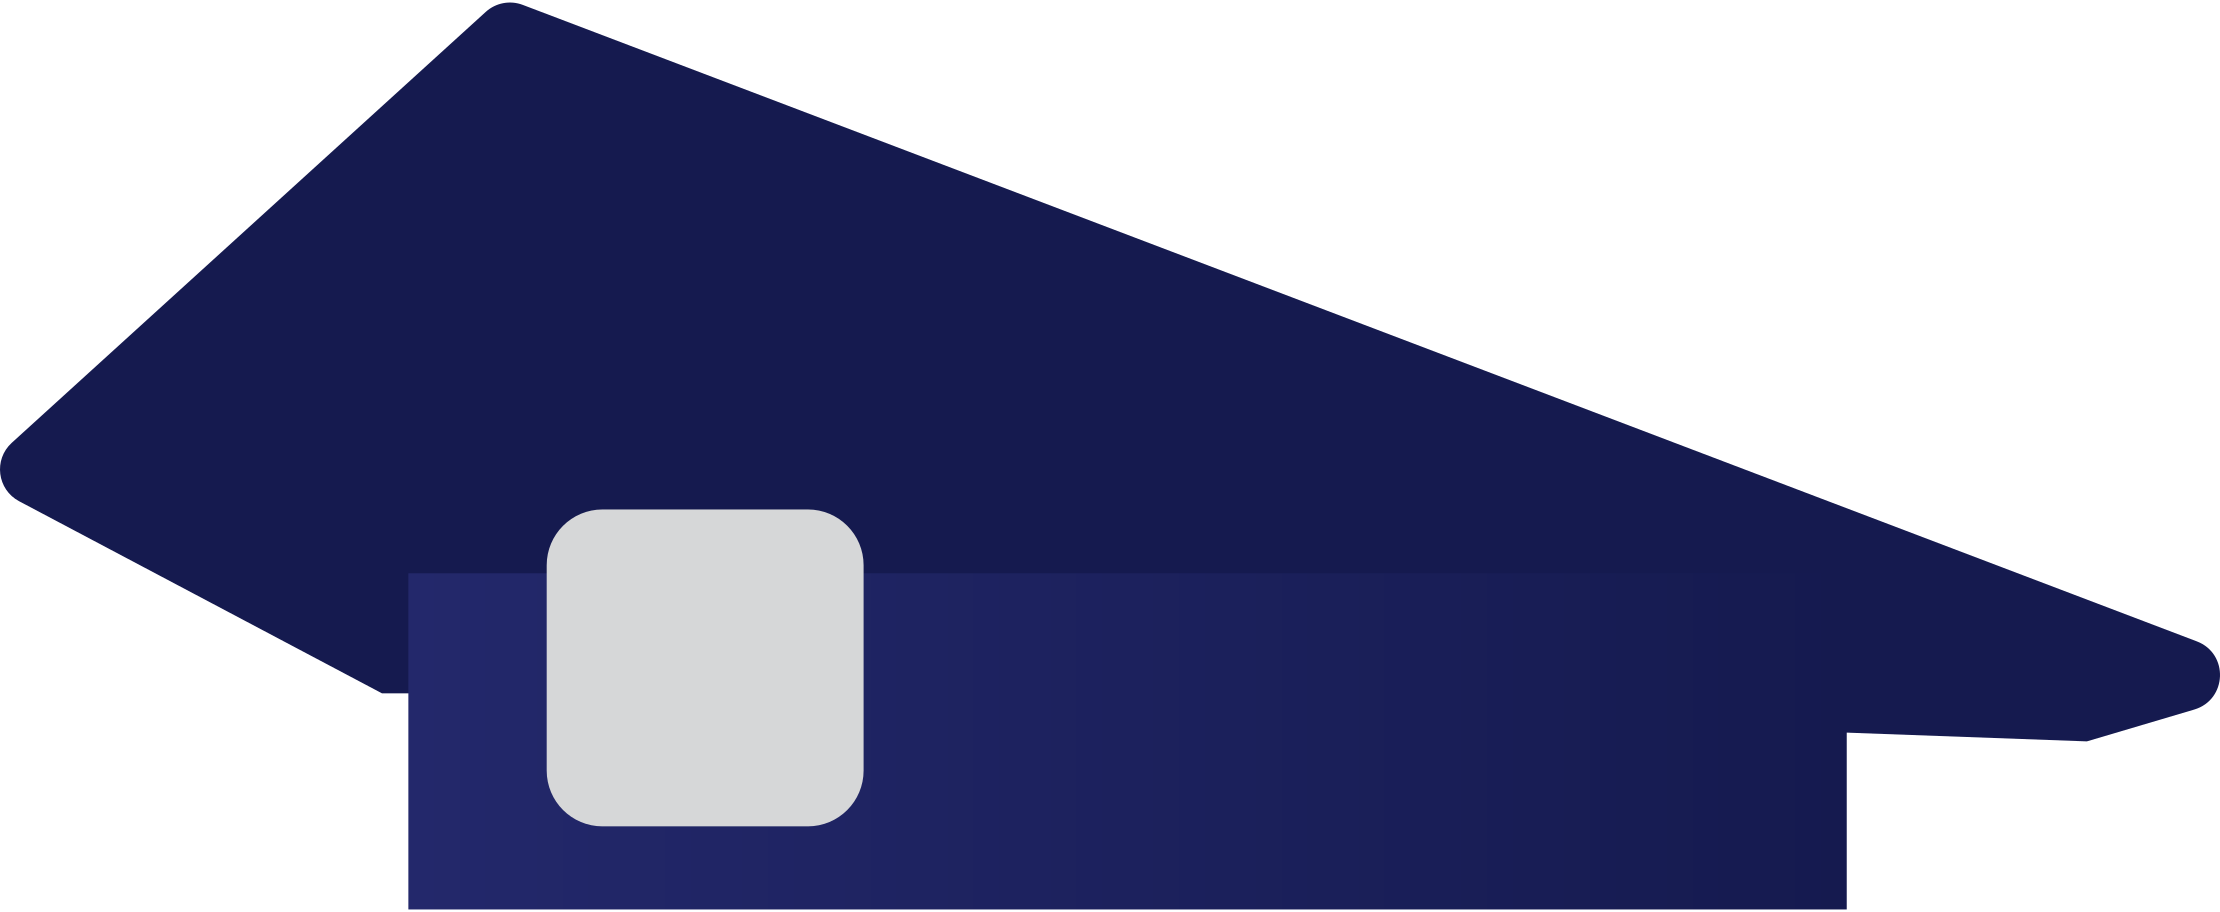 policeman cap Clipart illustration in PNG, SVG